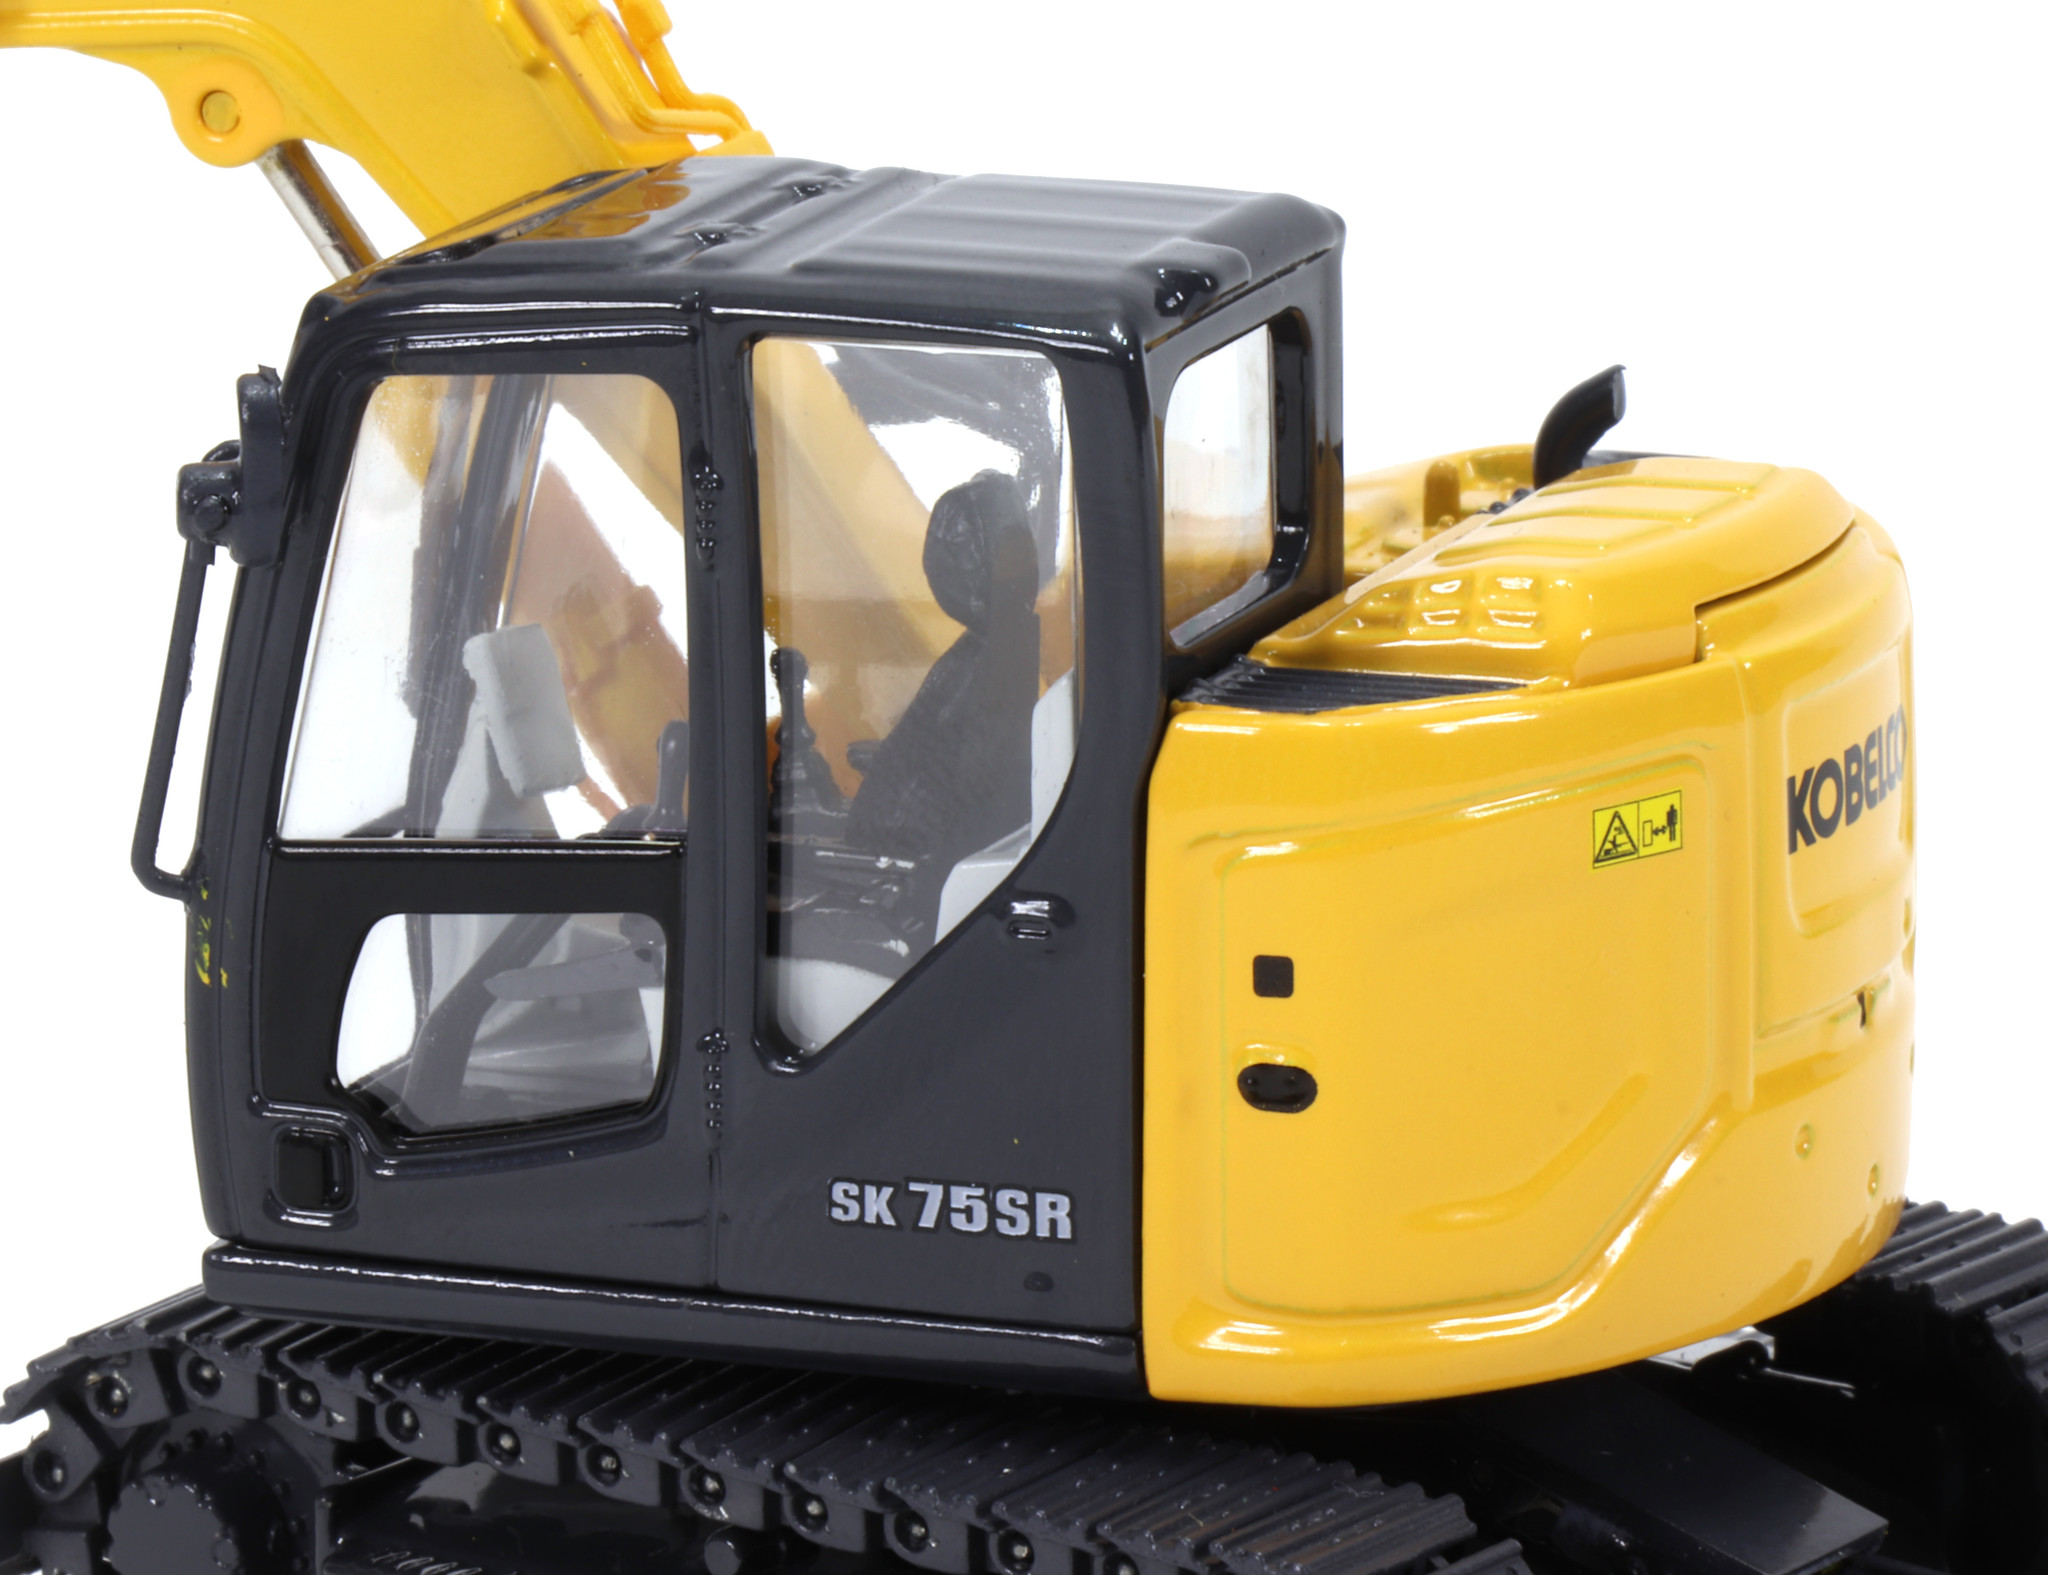 SK75SR-7 Modello in scala gialla USA